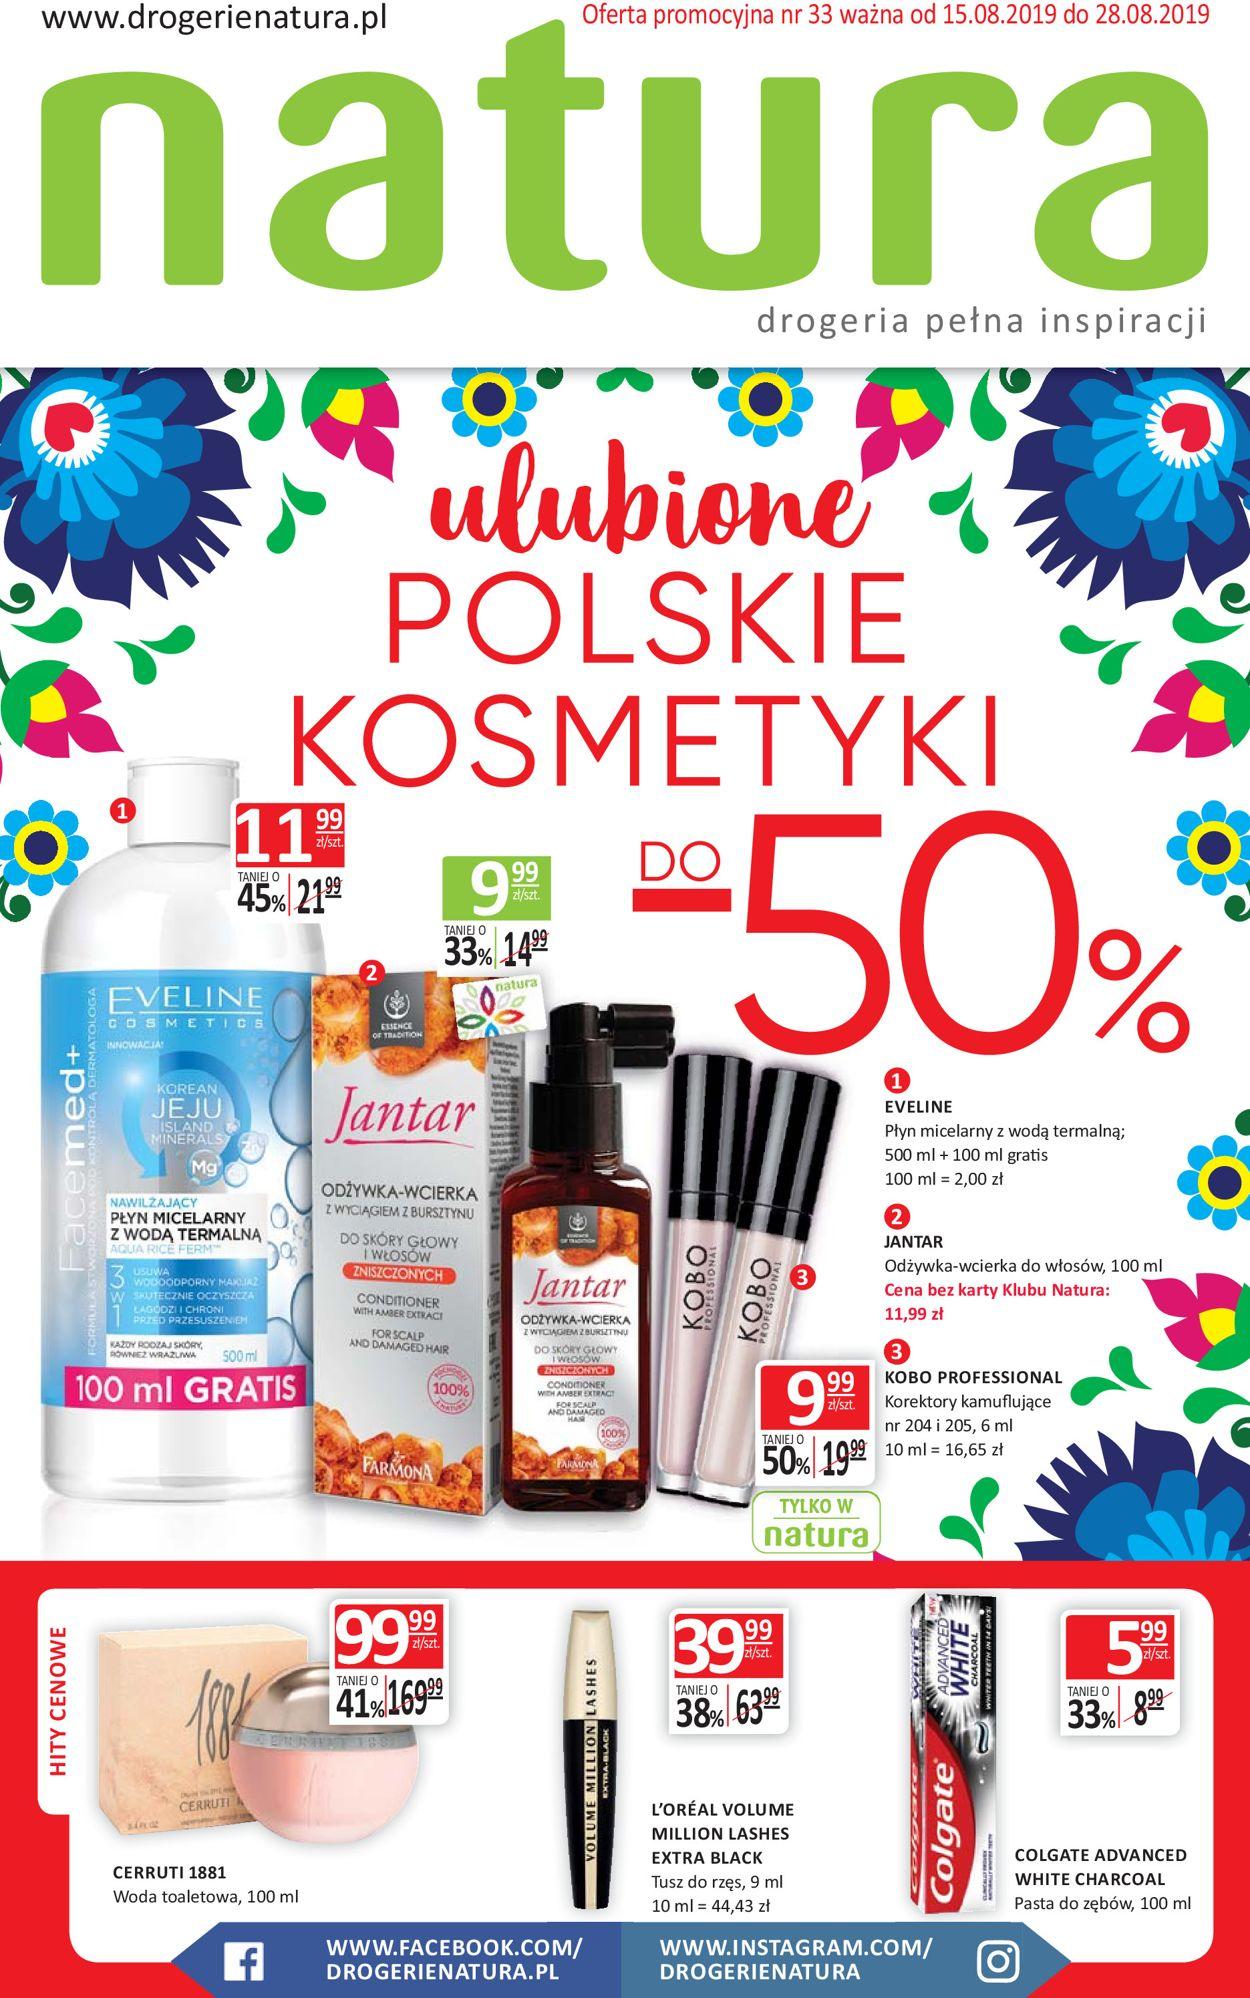 Gazetka promocyjna Natura - 15.08-28.08.2019